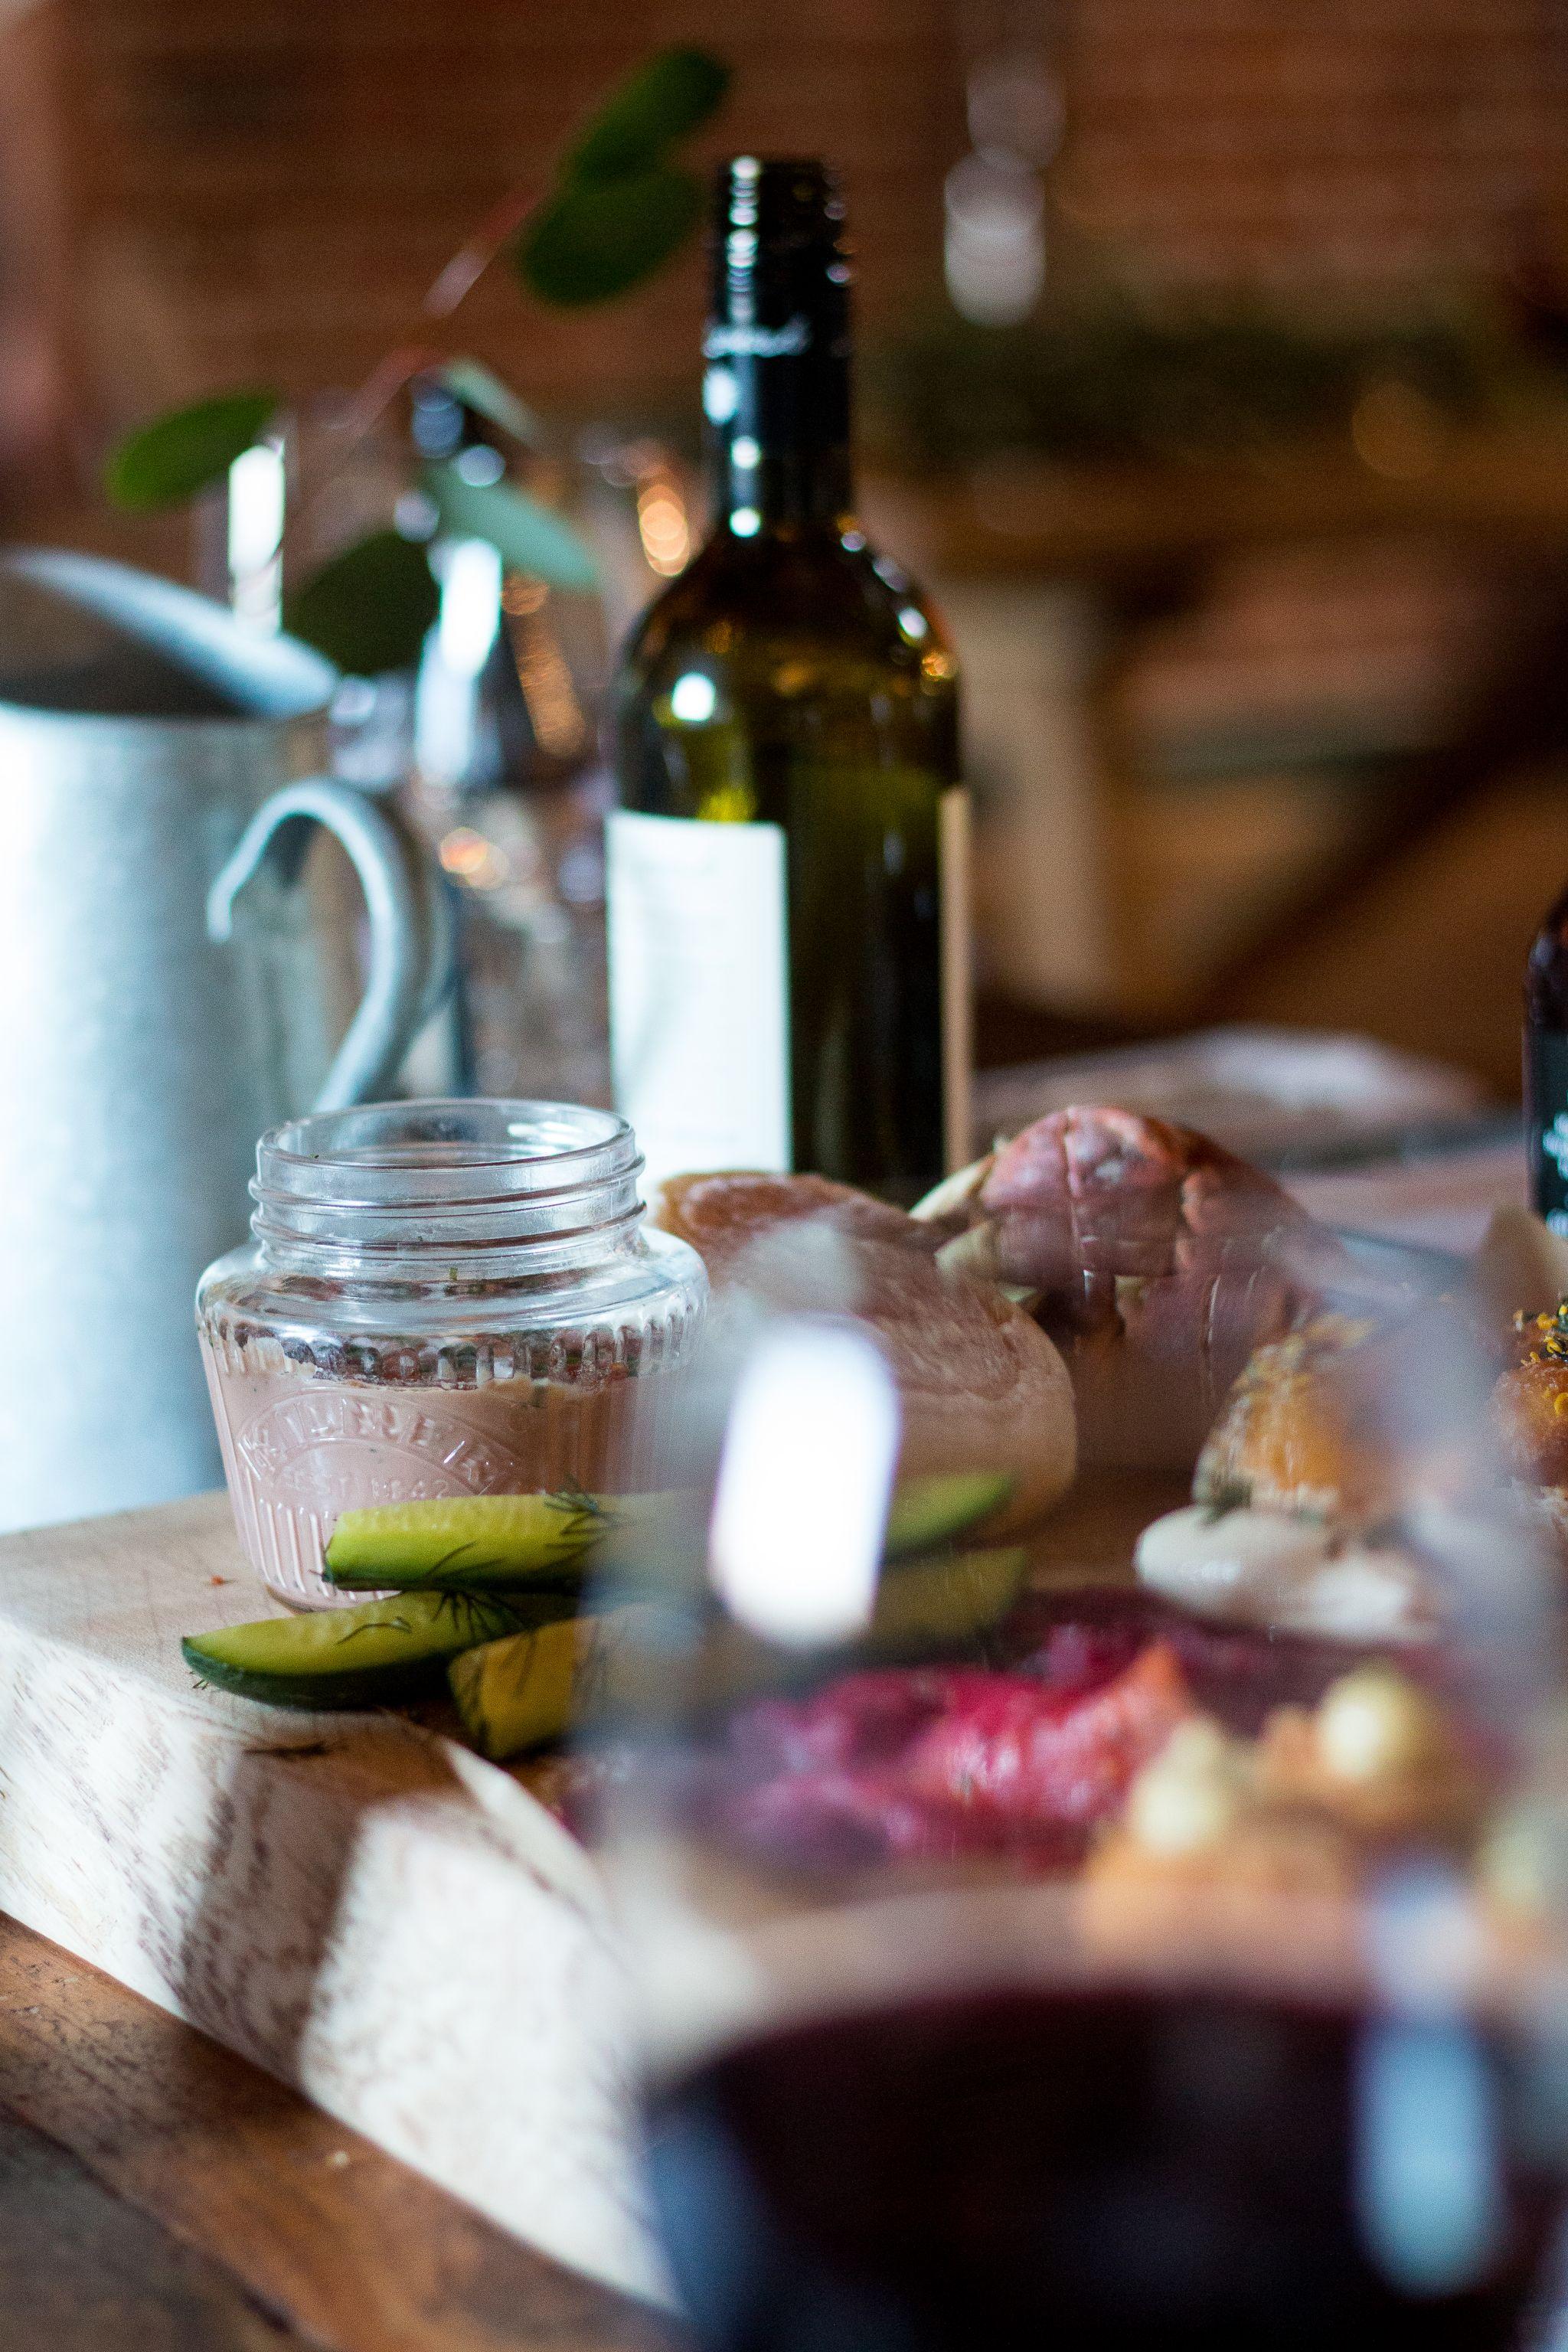 bonded warehouse food photography sunderland wedding menus